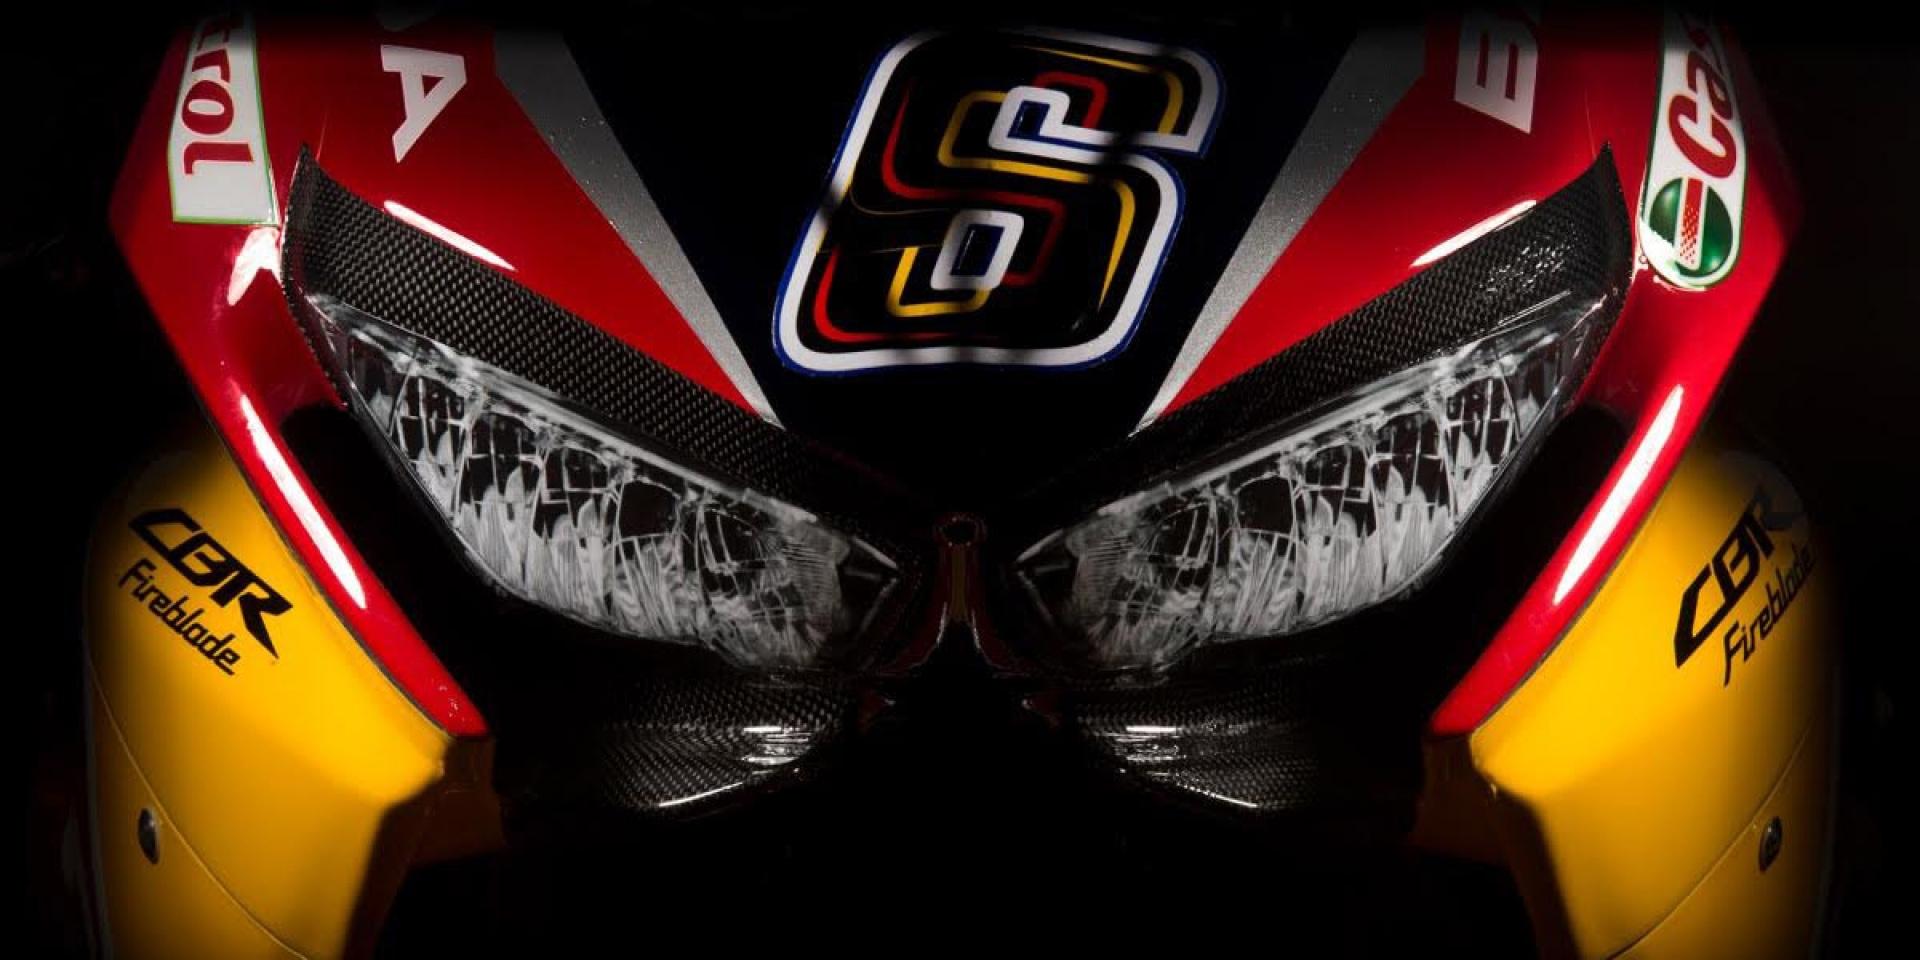 猛牛加持!Red Bull HONDA Superbike Team正式登場